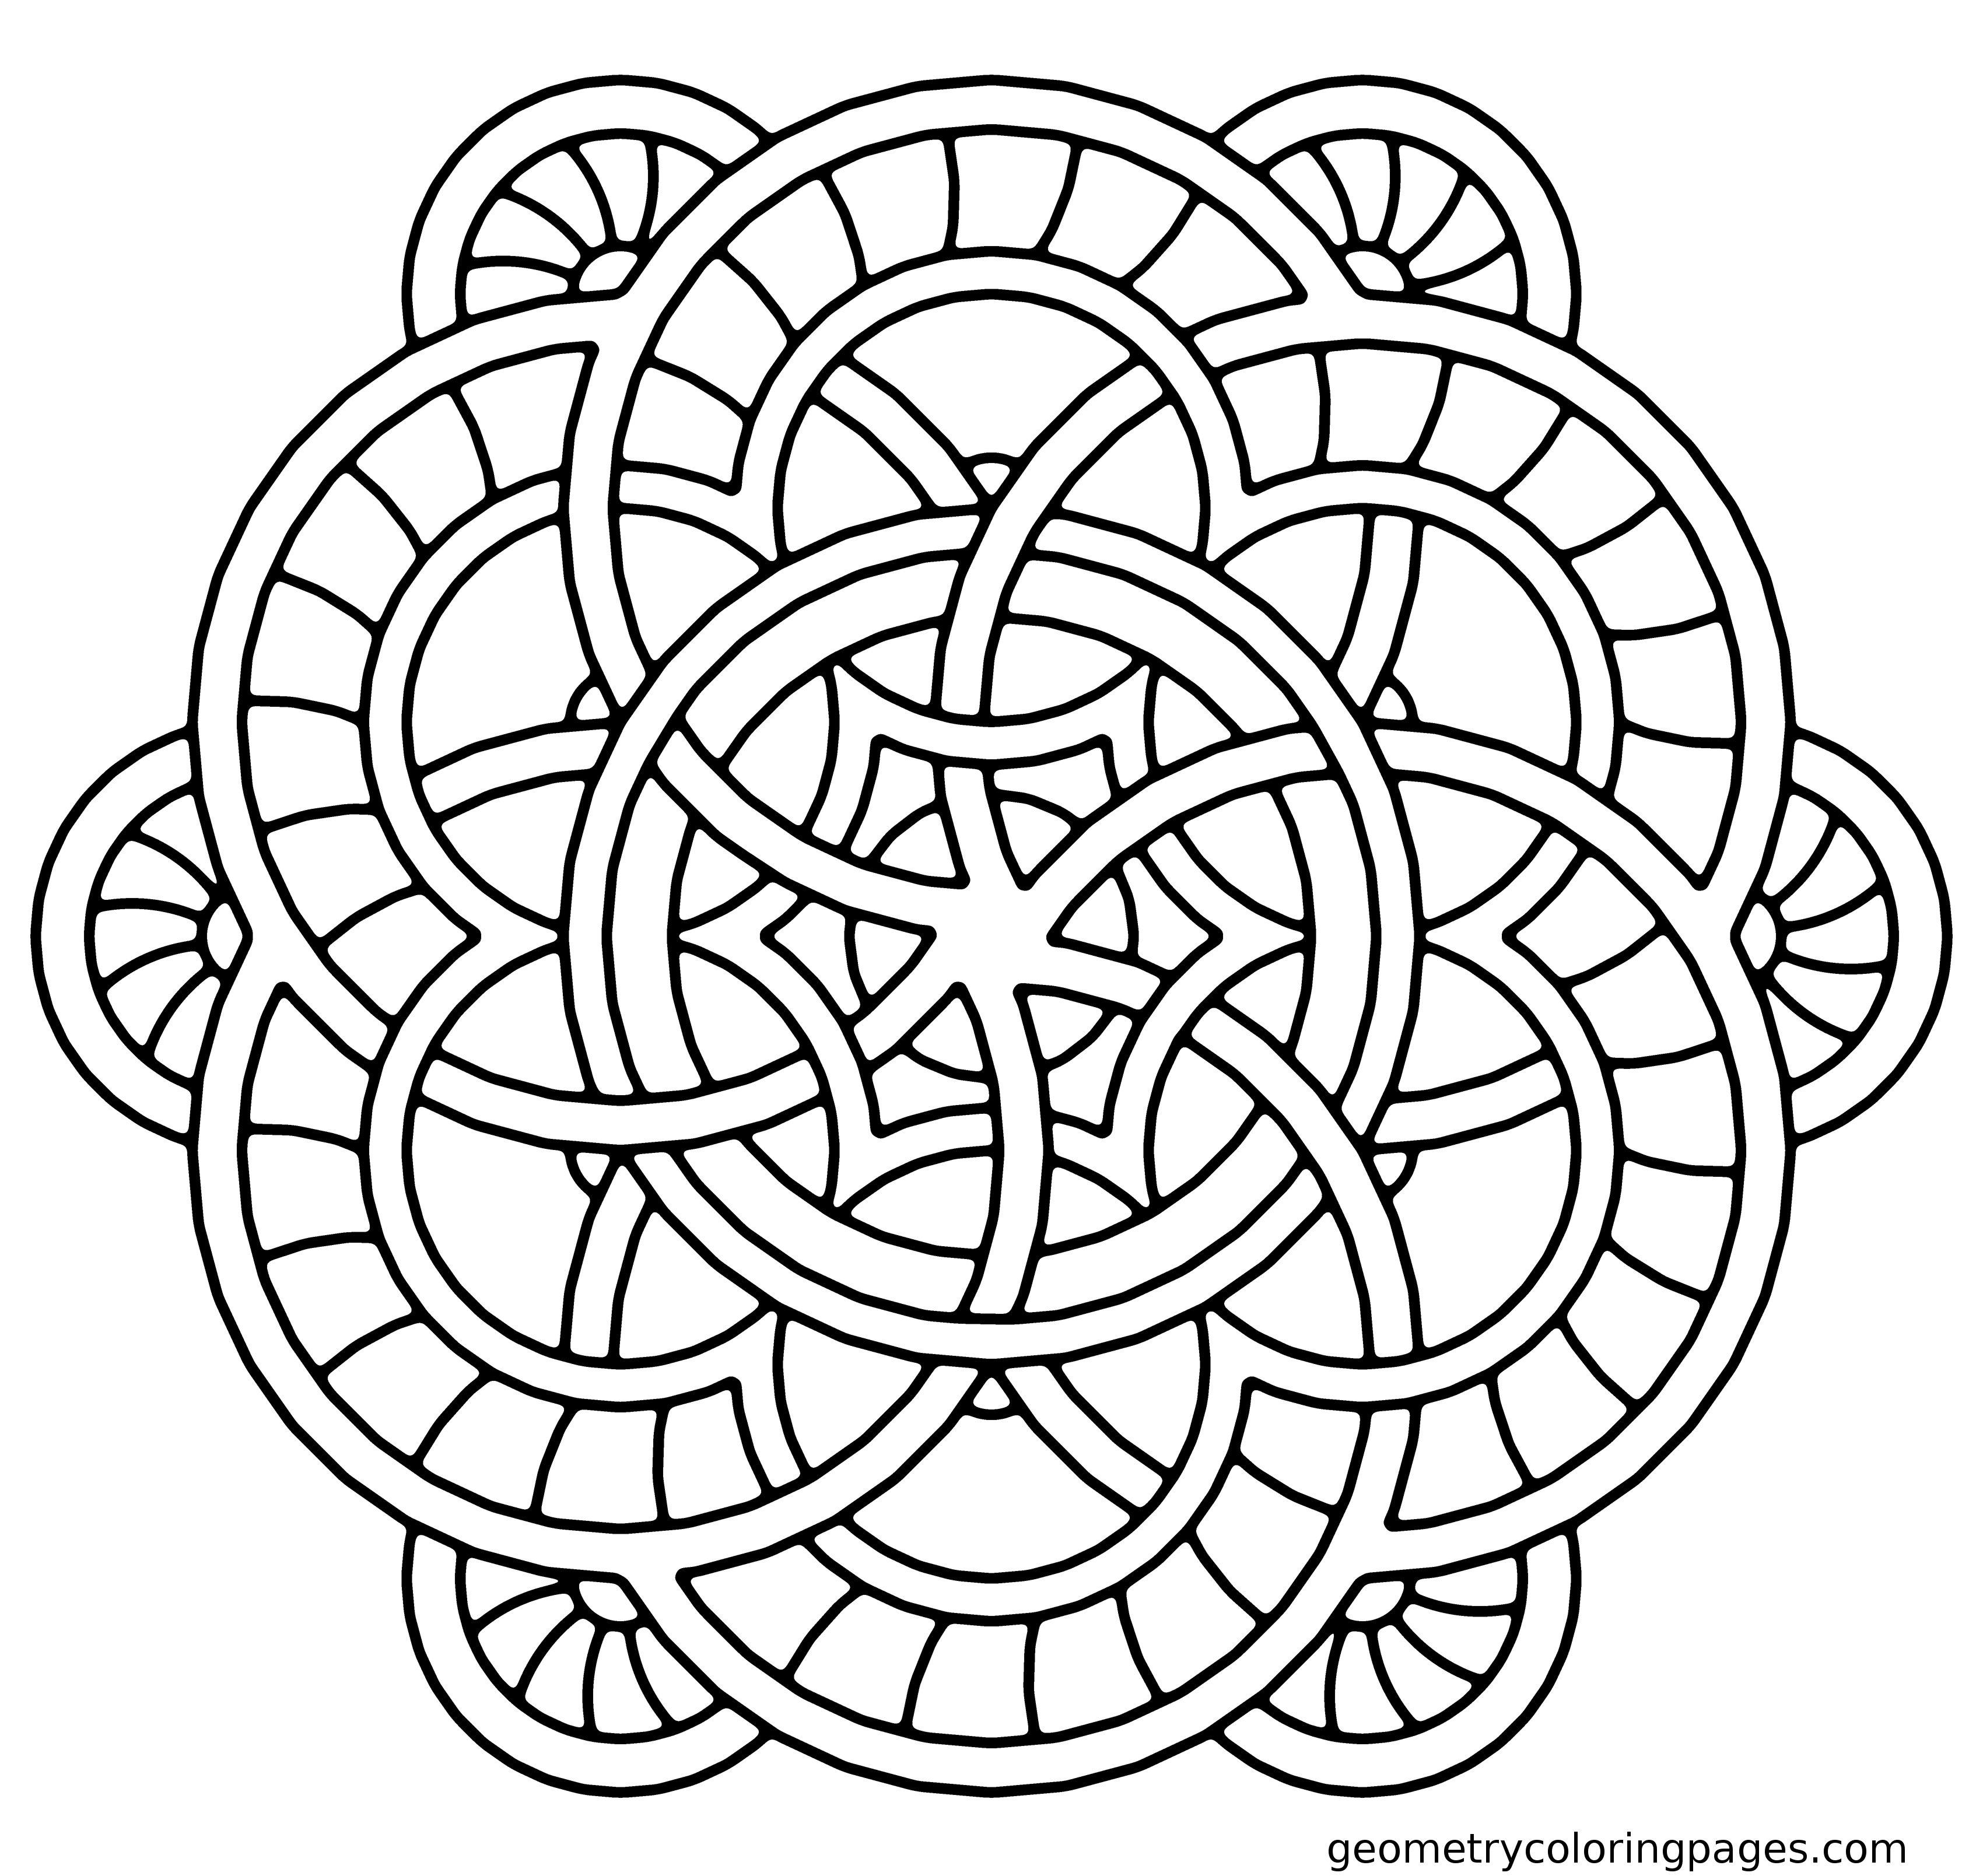 3400x3217 Printable Mandala Coloring Pages Coloring Pages Kids Mandala